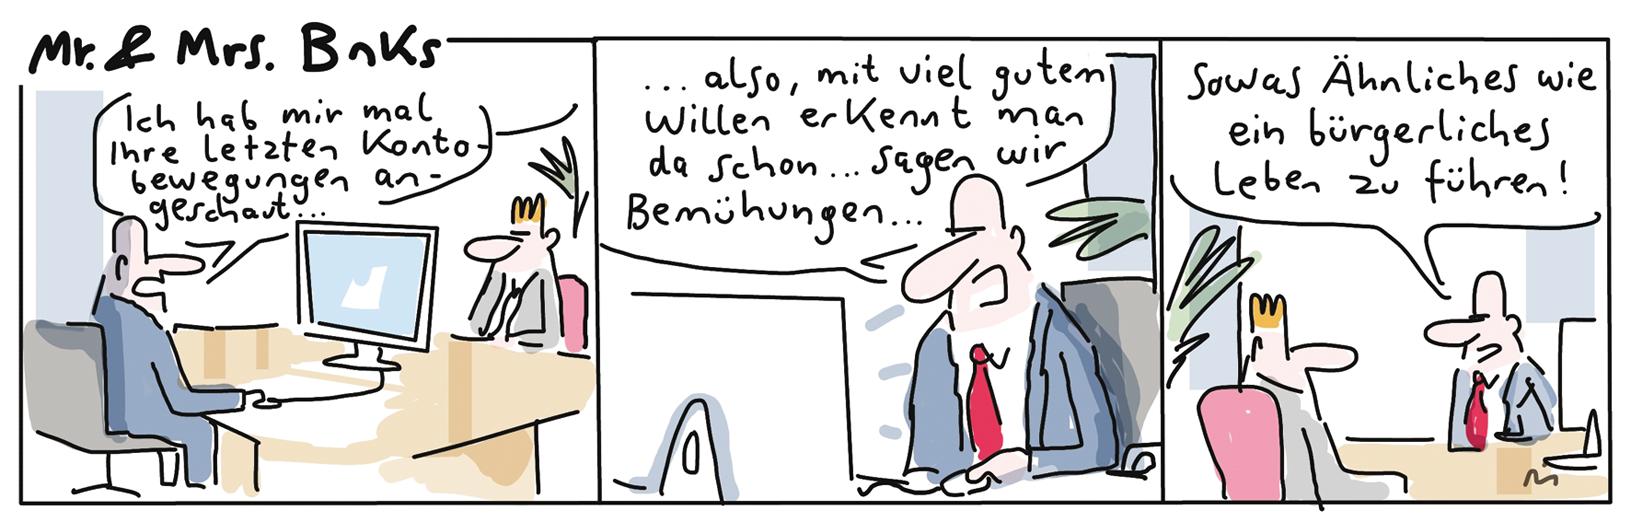 Bankingnews_Ausgabe_222_Nr02_Comic